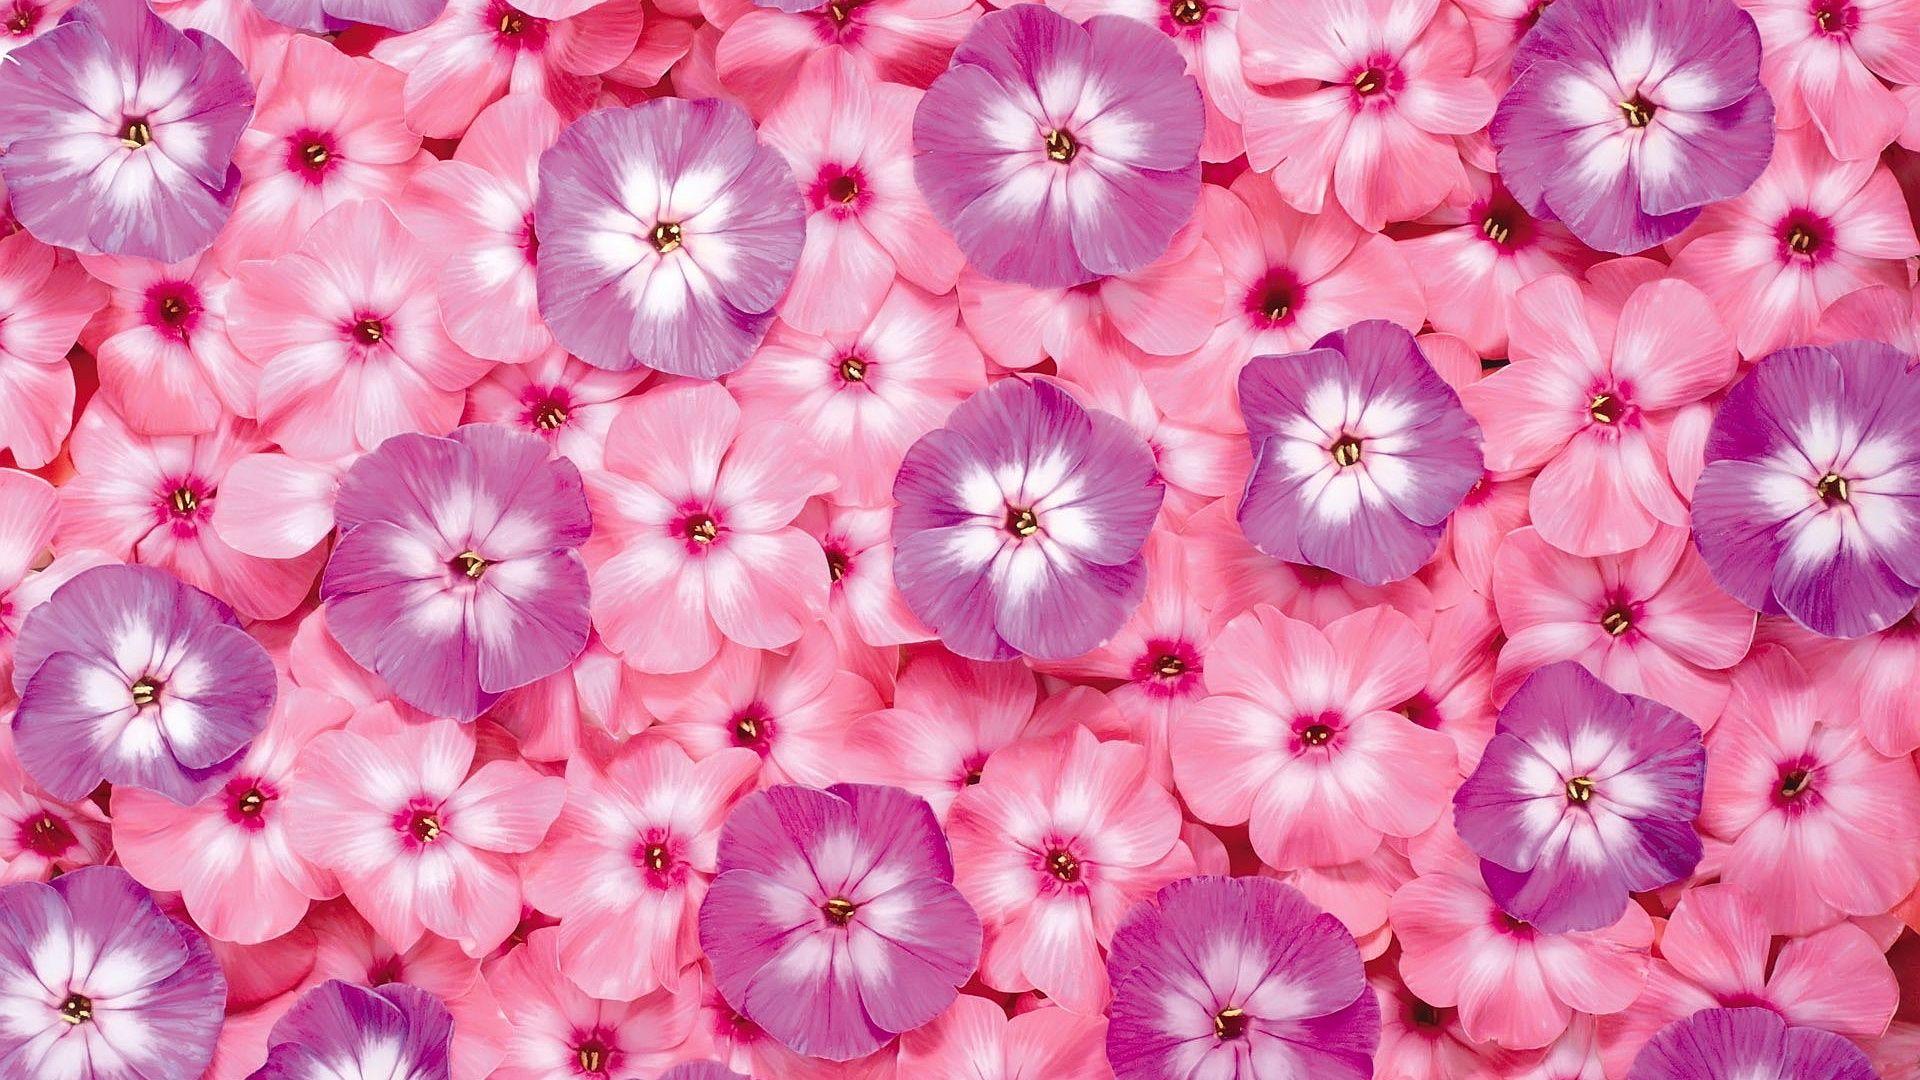 Pink Flower Wallpaper 1080p For Desktop Wallpaper With Images